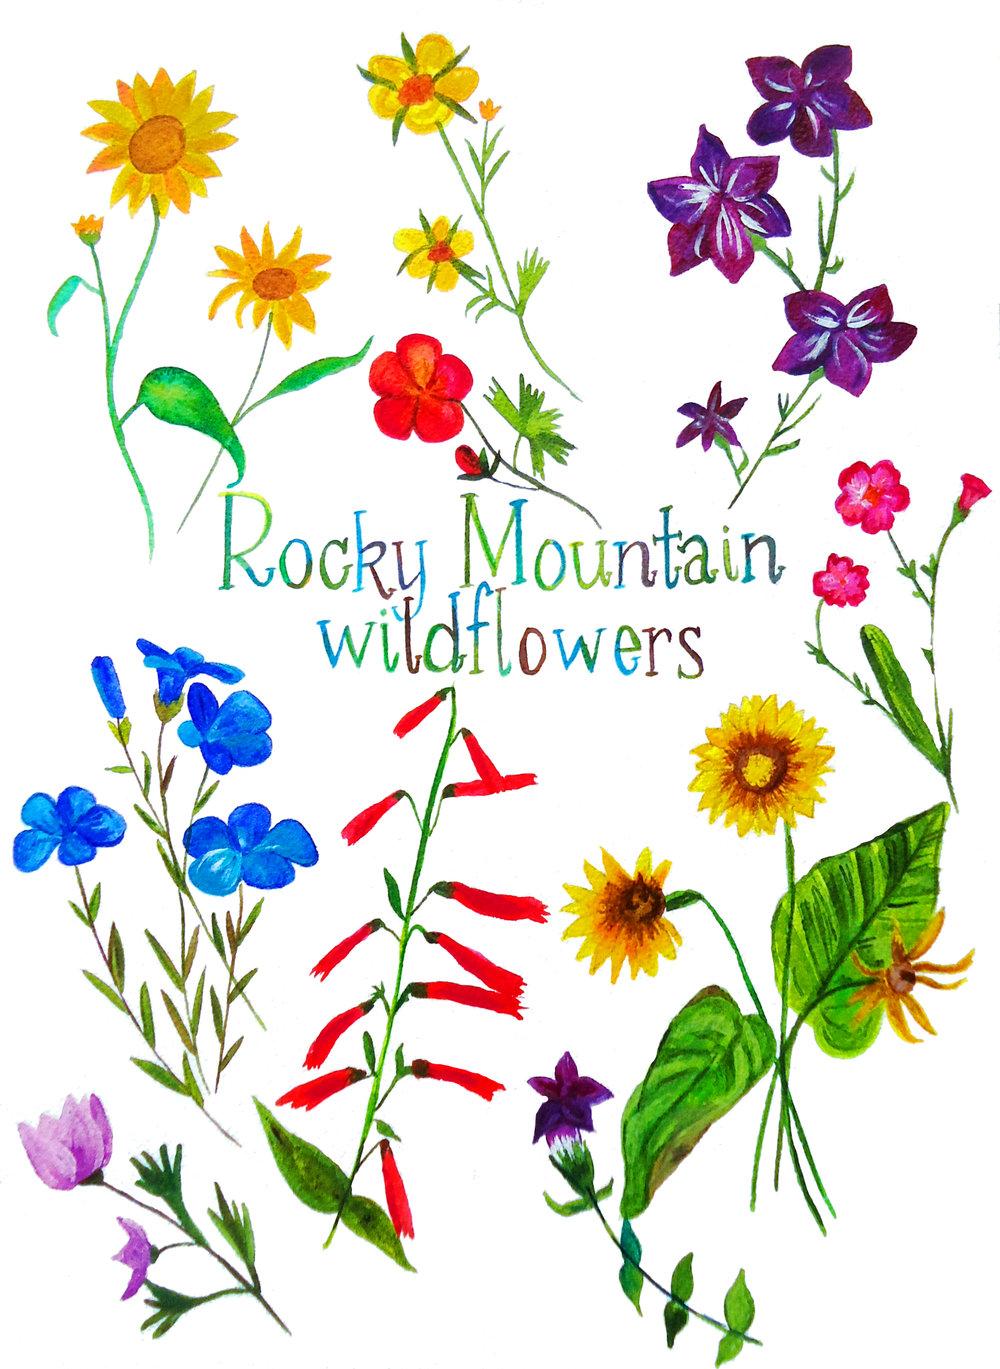 rocky mountain wildflowers.JPG